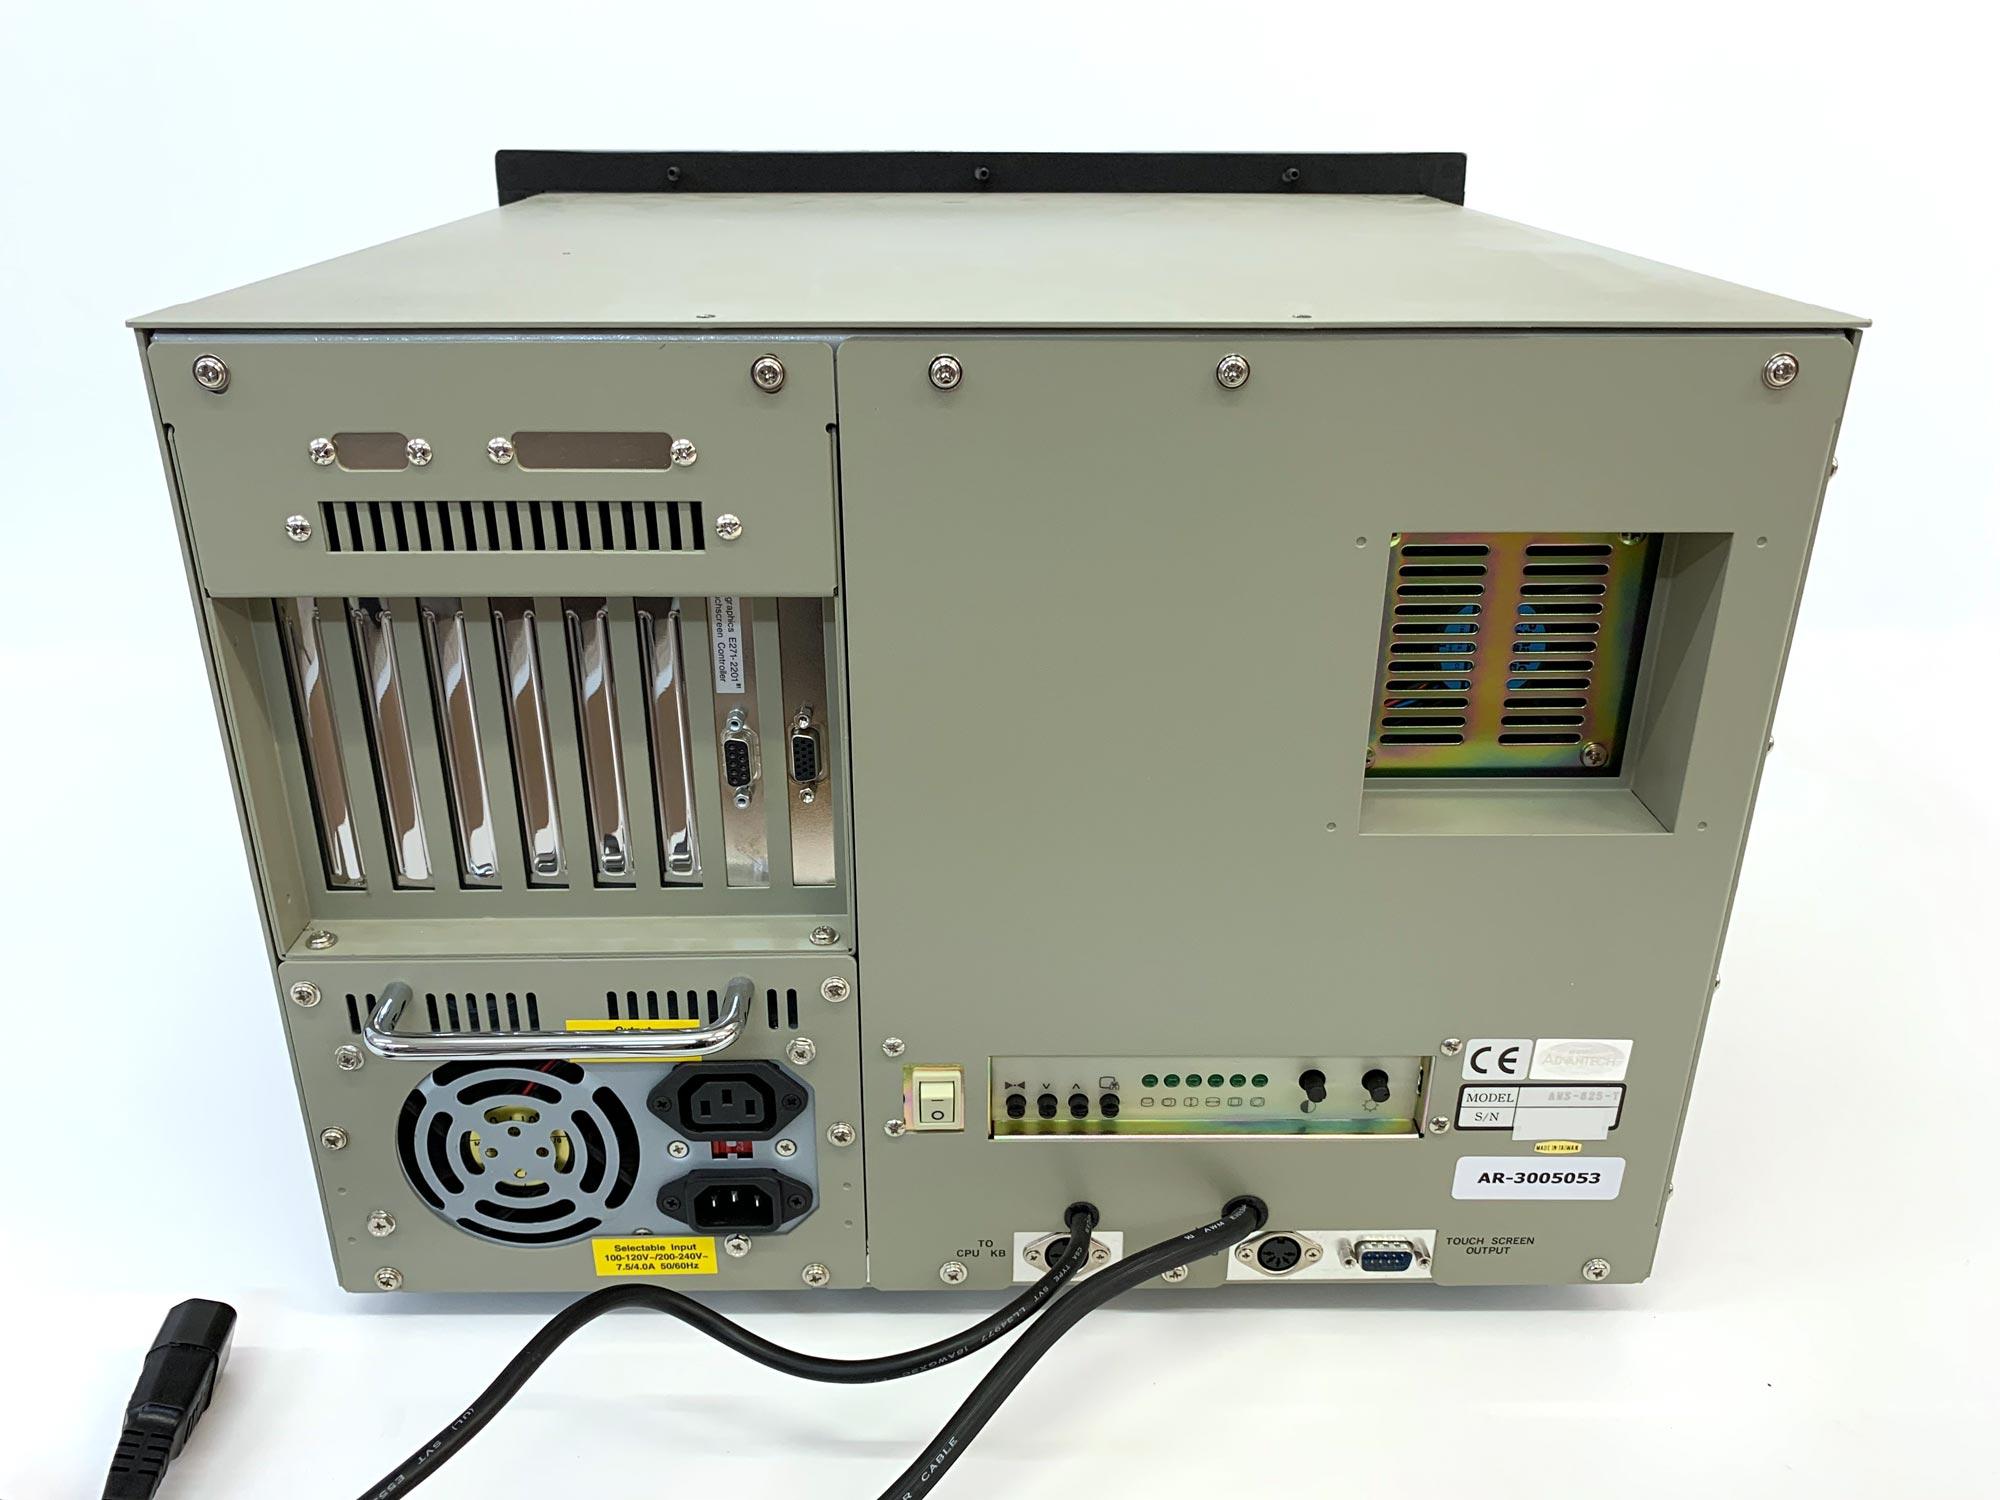 "AWS-825-T - Industrie Workstation mit 15"" CRT Display"